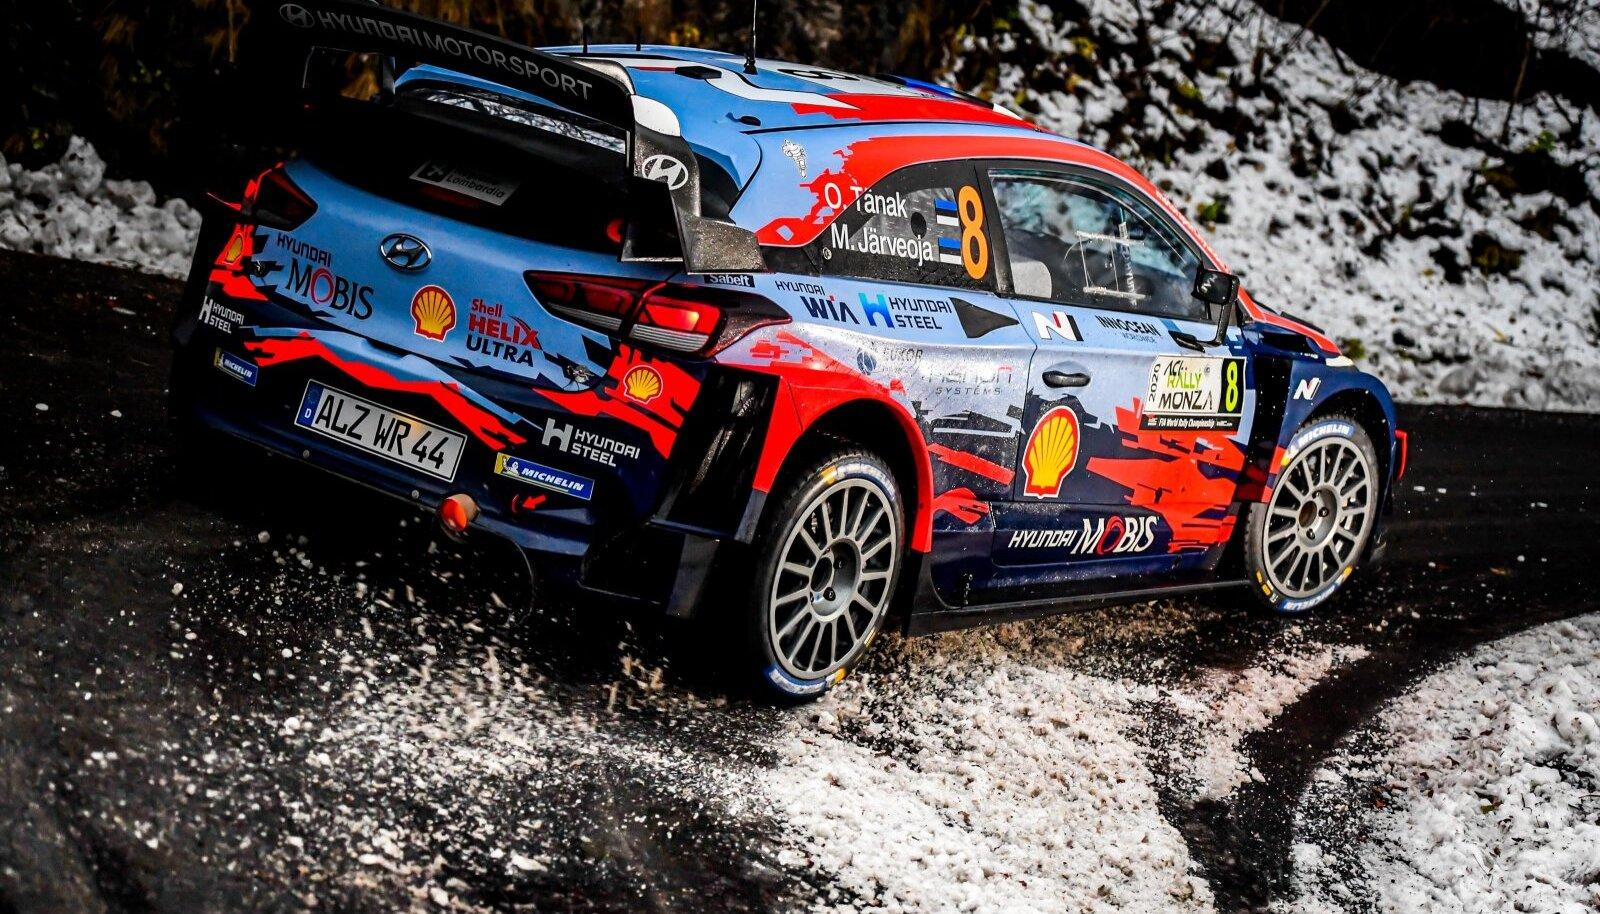 OTT TANAK AUTOMOBILE : WRC, Motorsport Rallye, WM ACI rallye Monza - 05/12/2020 SPRESSE/PANORAMIC PUBLICATIONxNOTxINxFRA